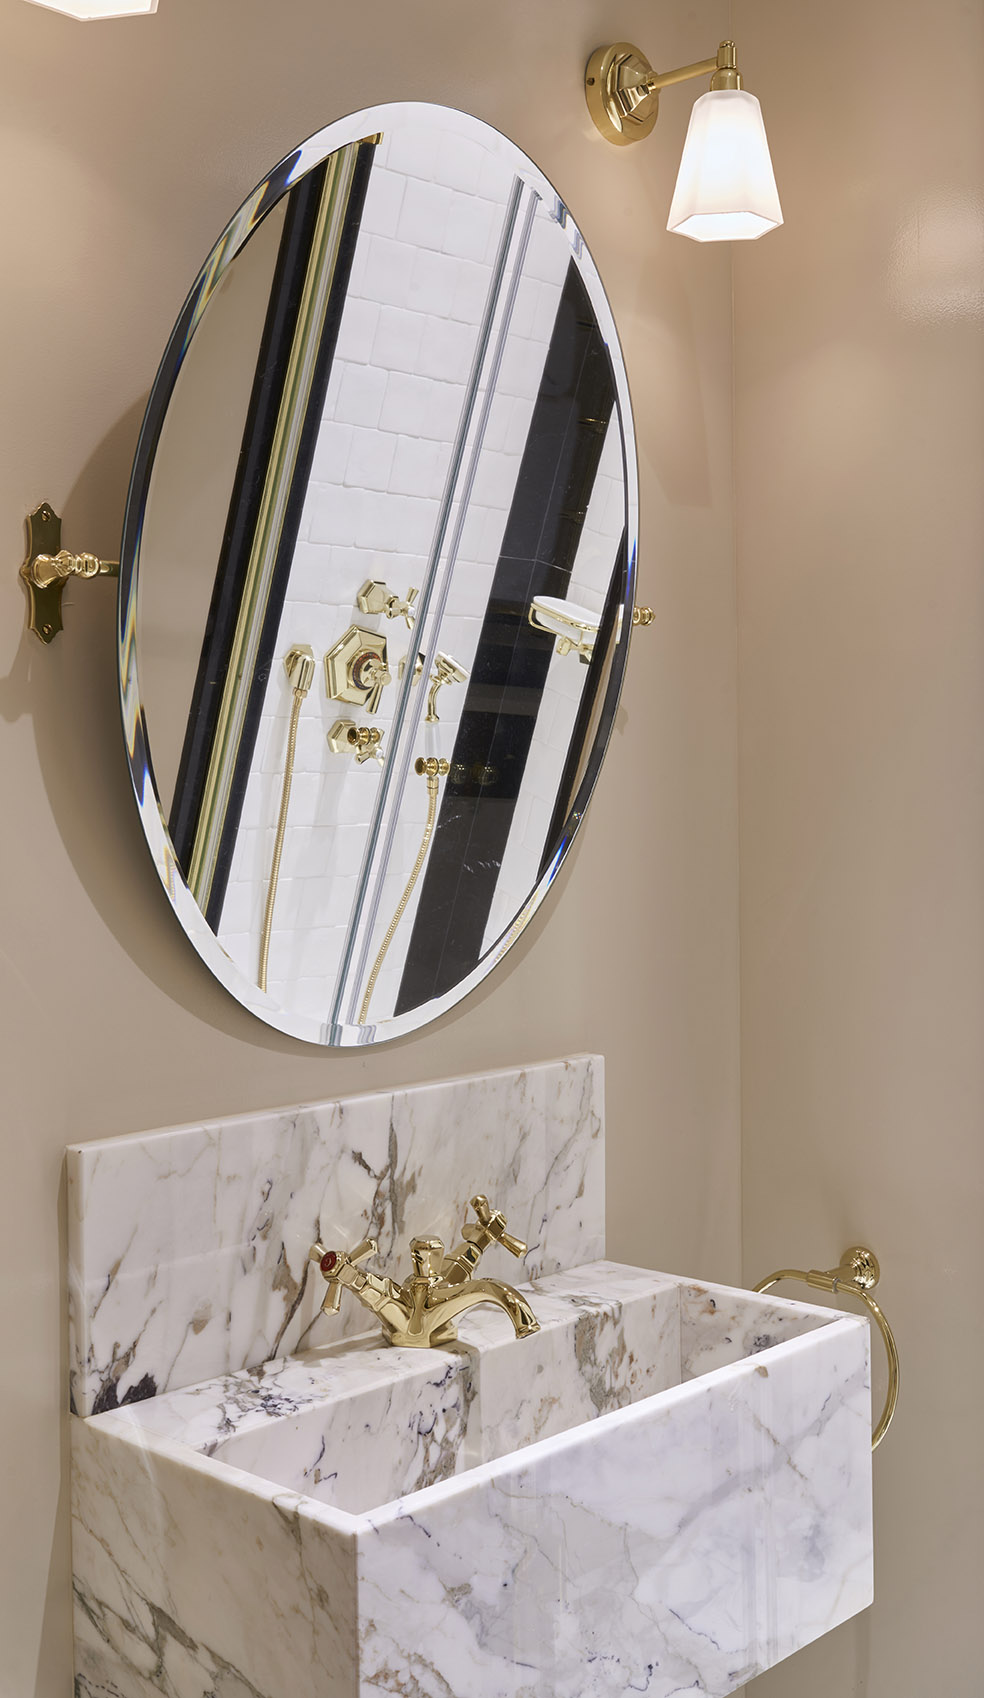 plan vasque semi massif breccia capraia salle de bain Omni Marbes hôtel Relais Christine